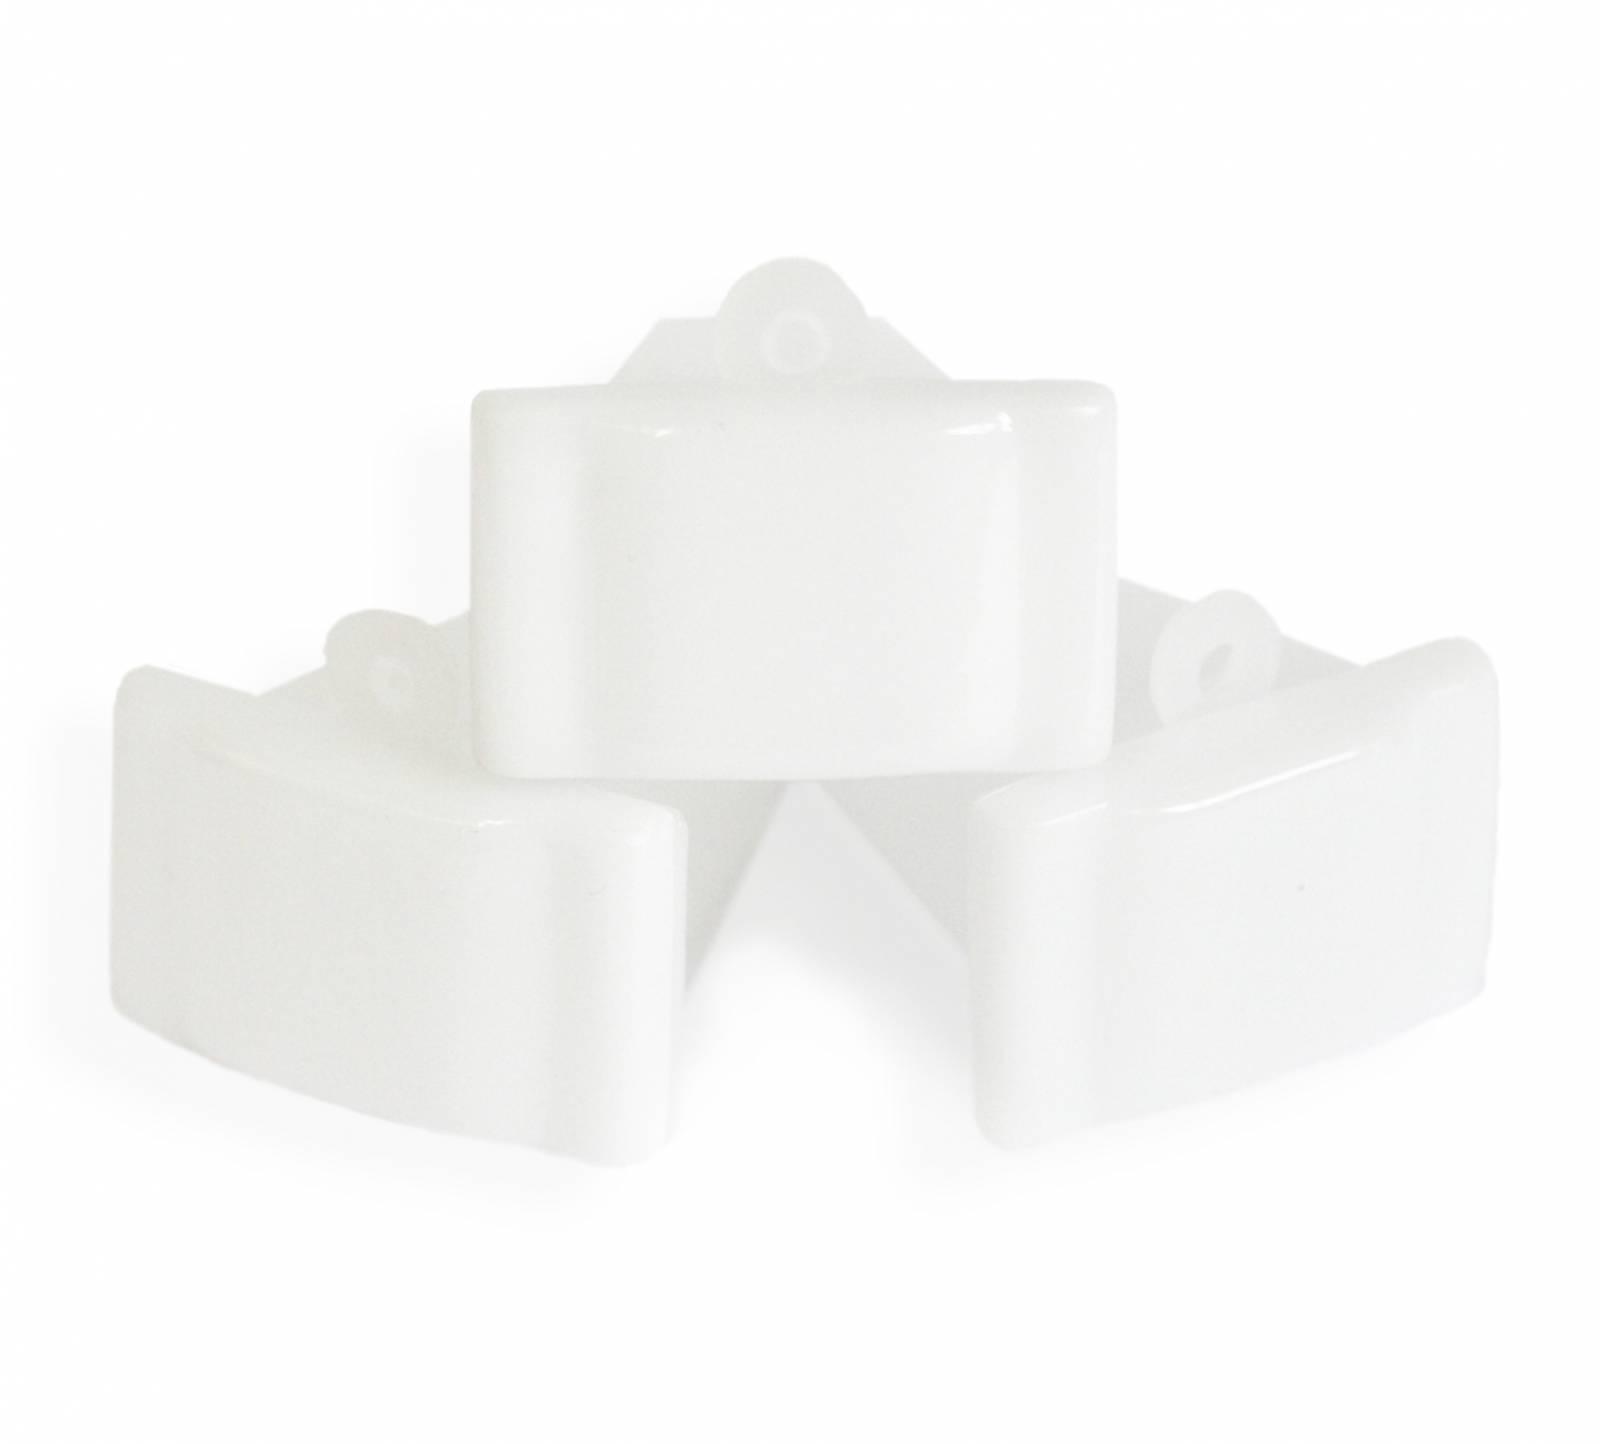 Monóculo Branco | kit c/10 unidades com foto